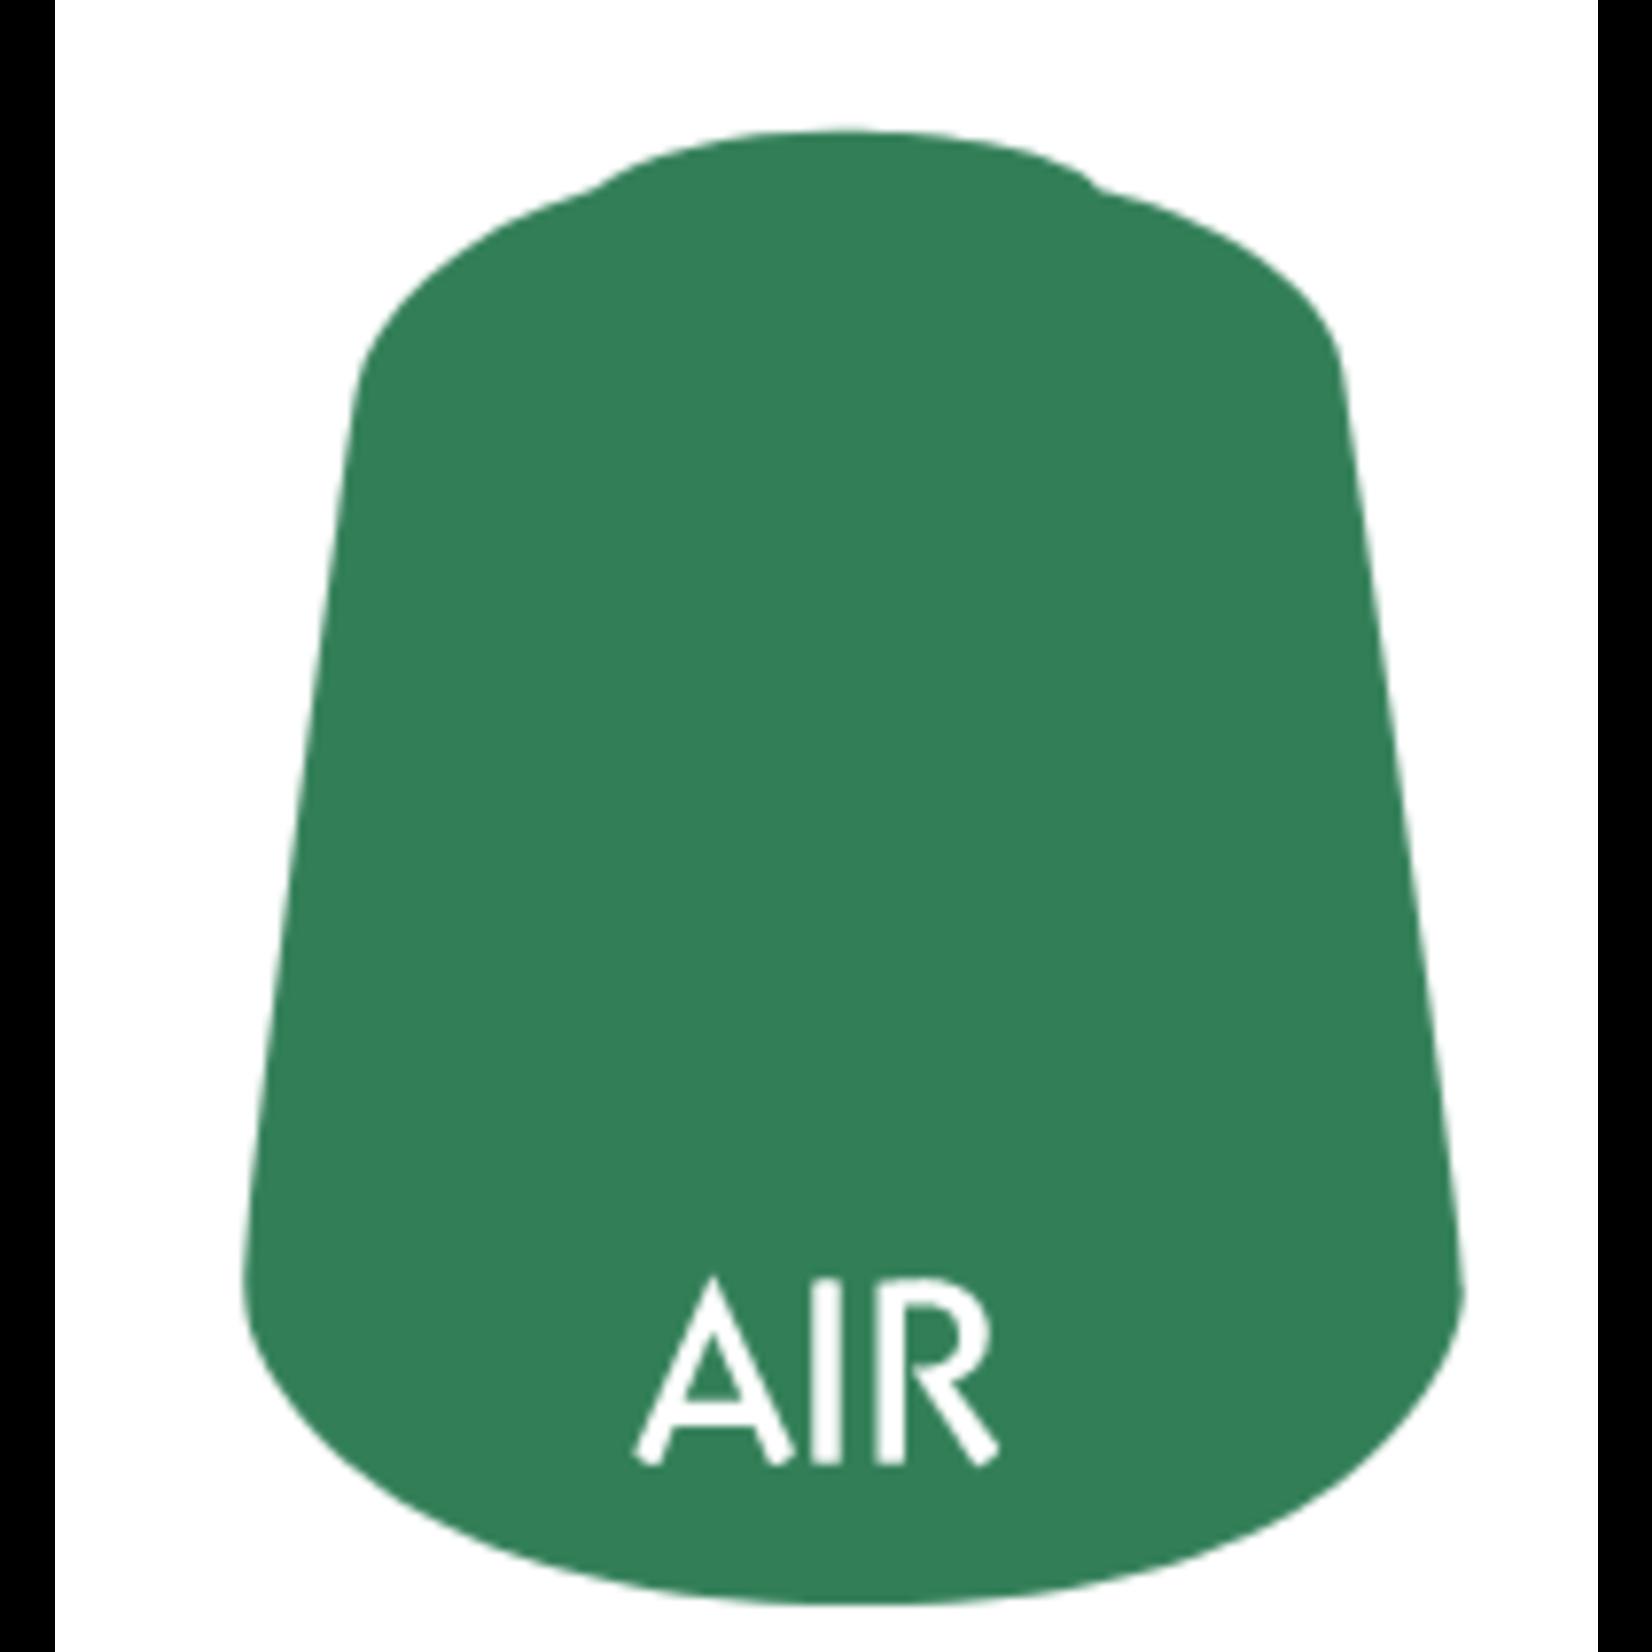 Games Workshop Air: Warboss  Green (24ml) Paint